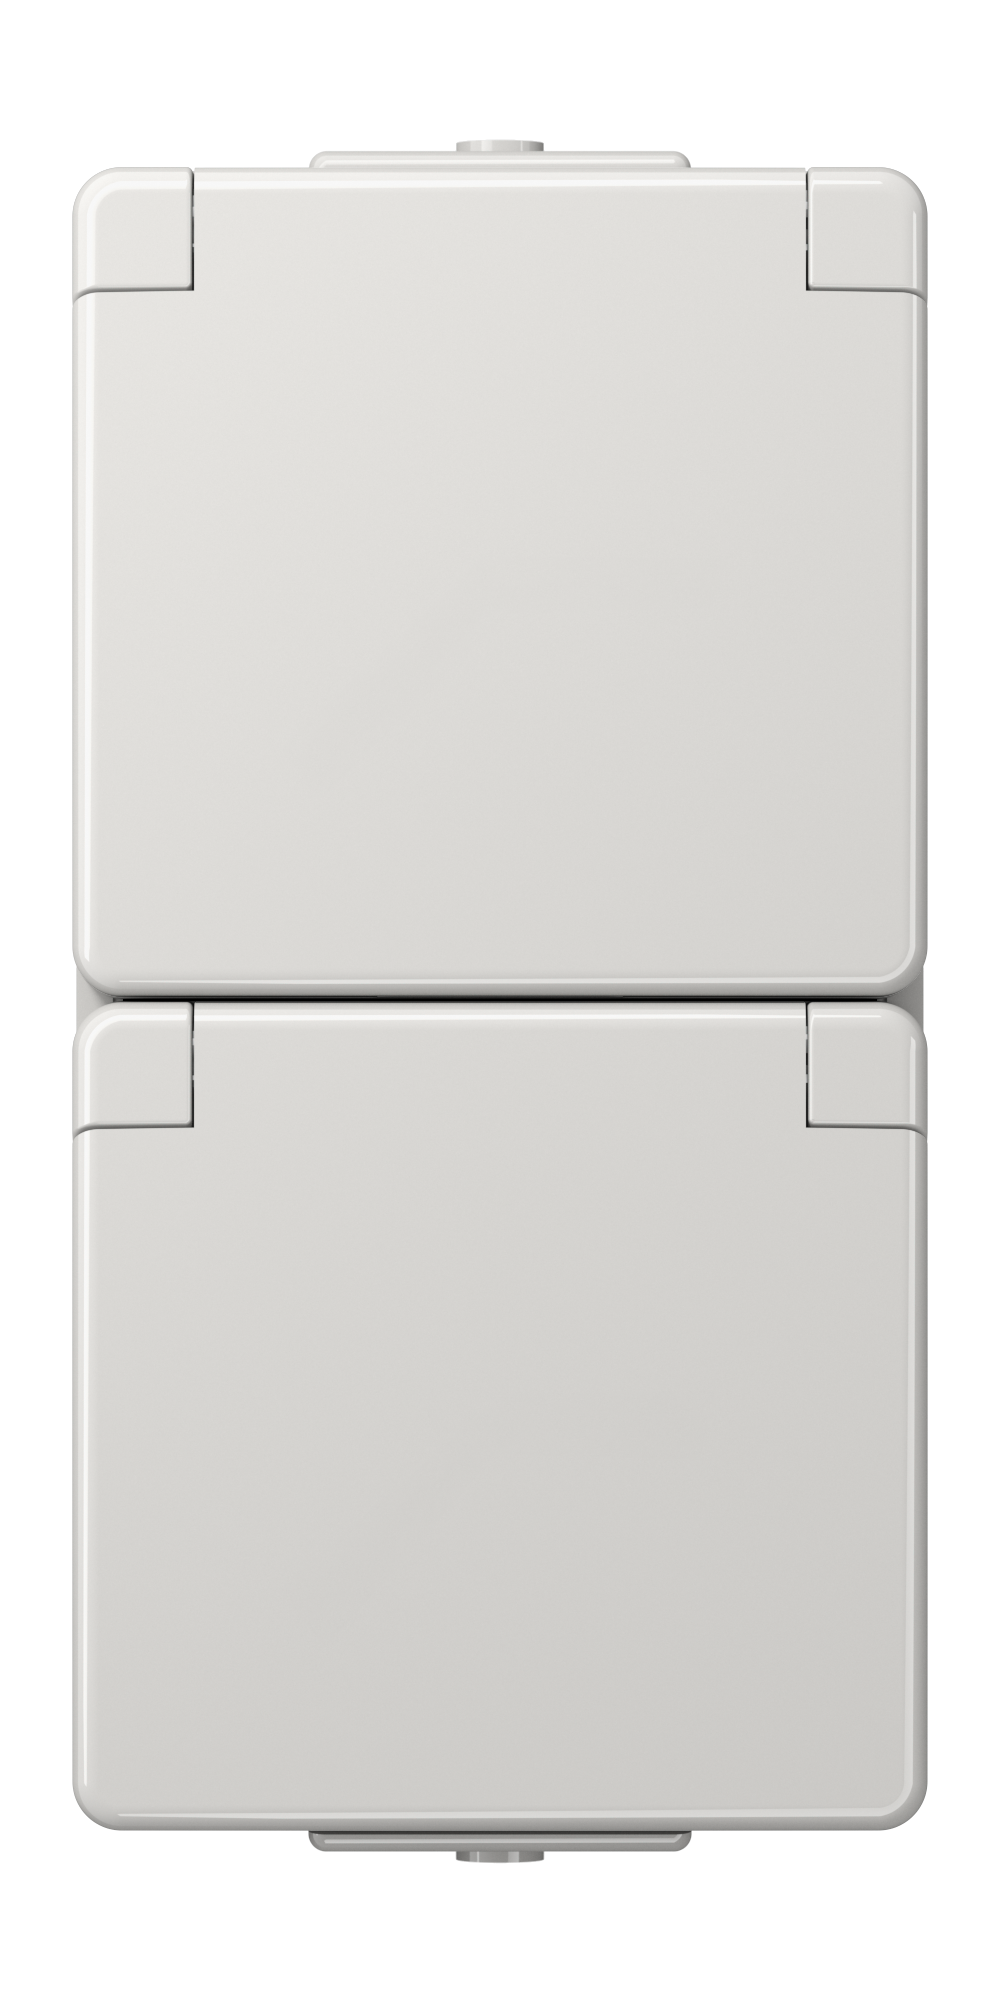 JUNG_WG600_socket-socket